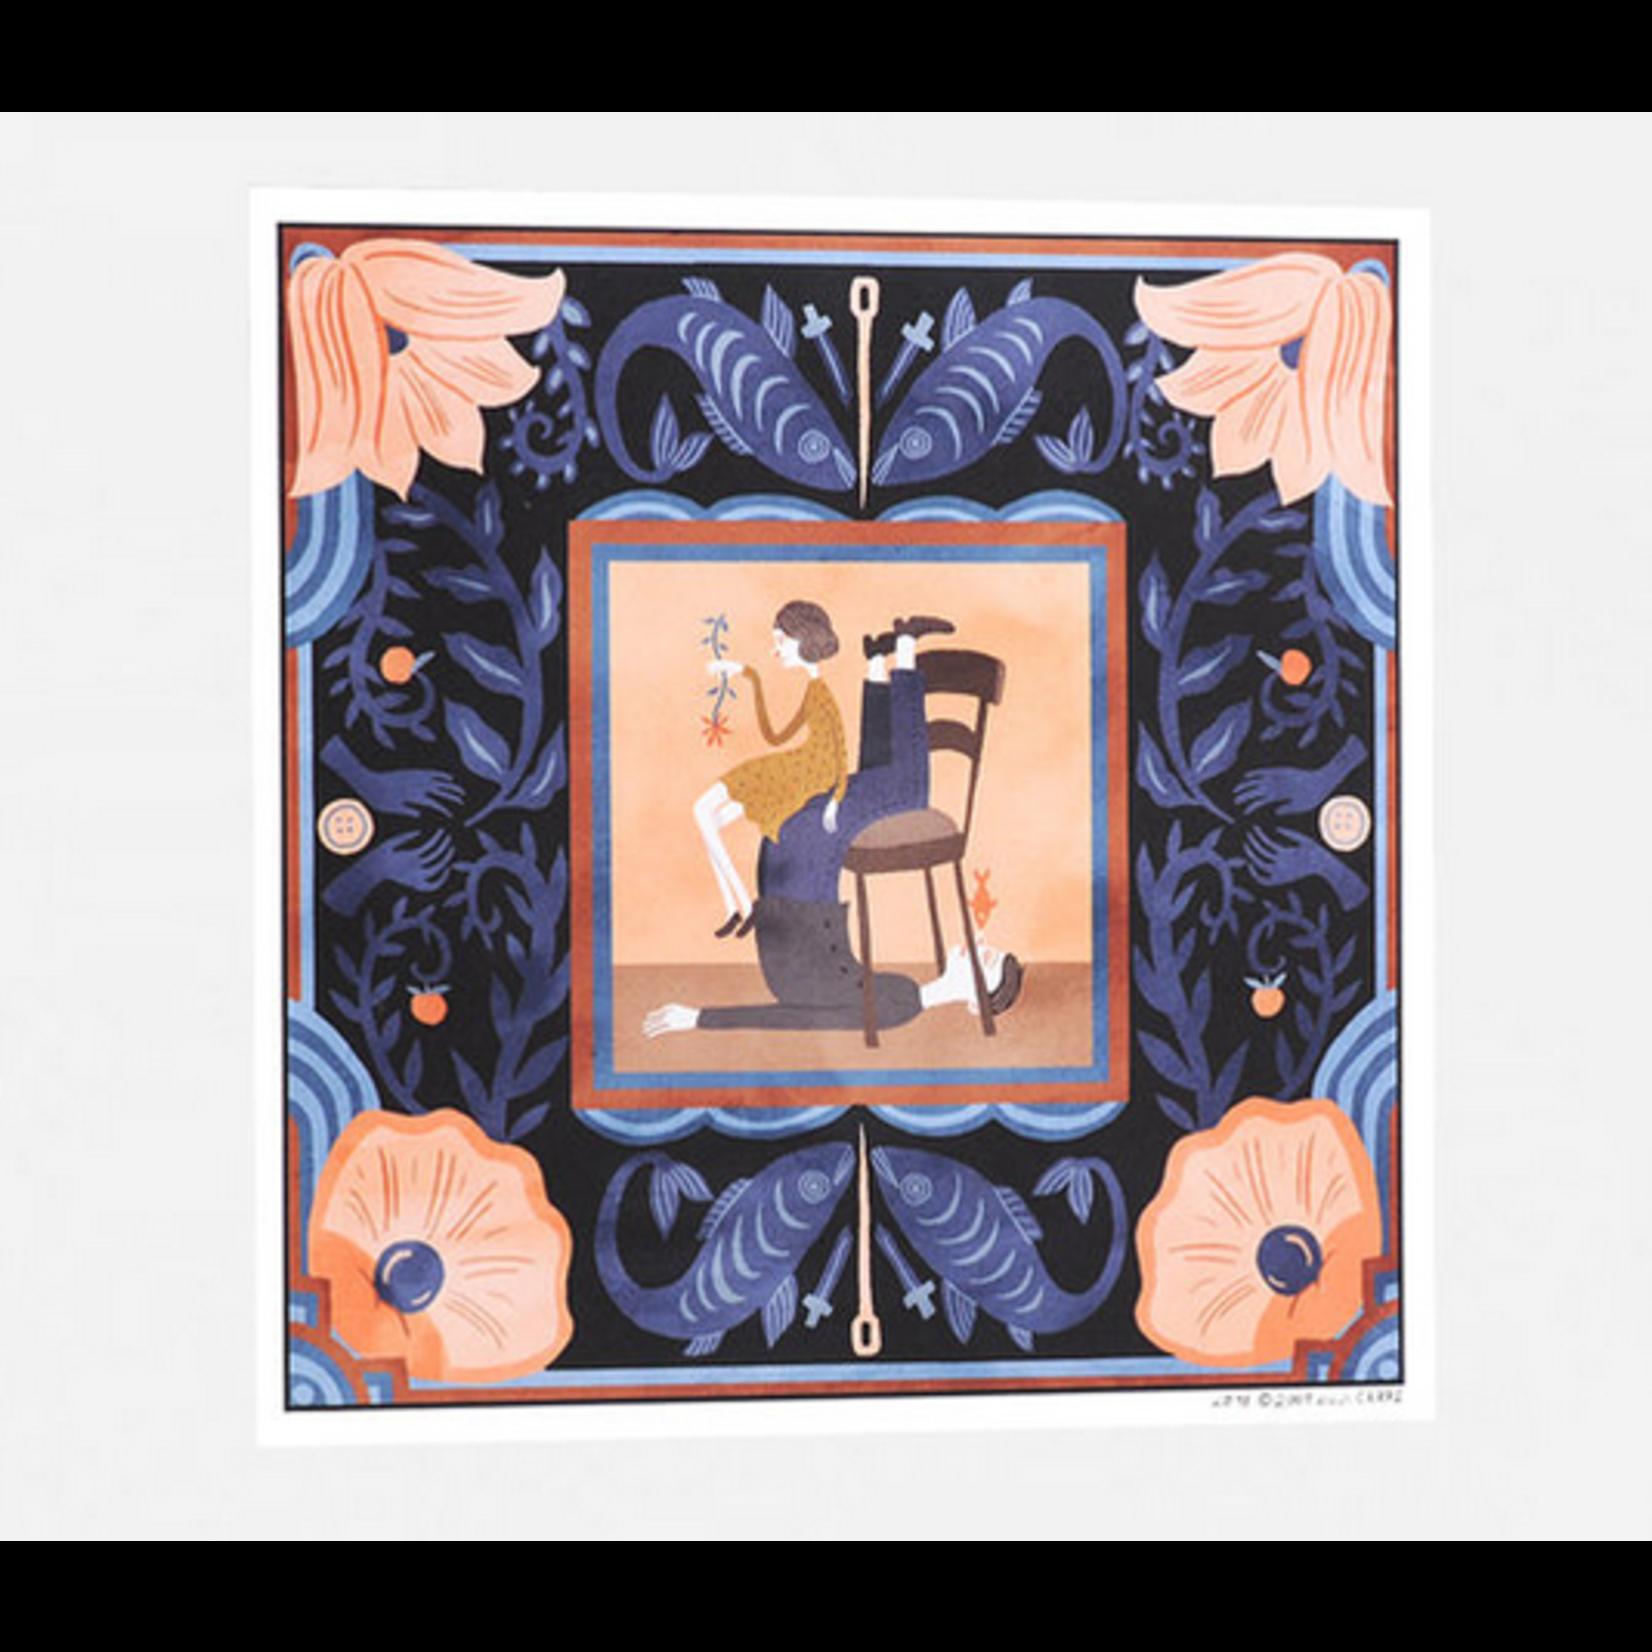 Little Otsu Nine Ways to Disappear 7x7.13 Art Print